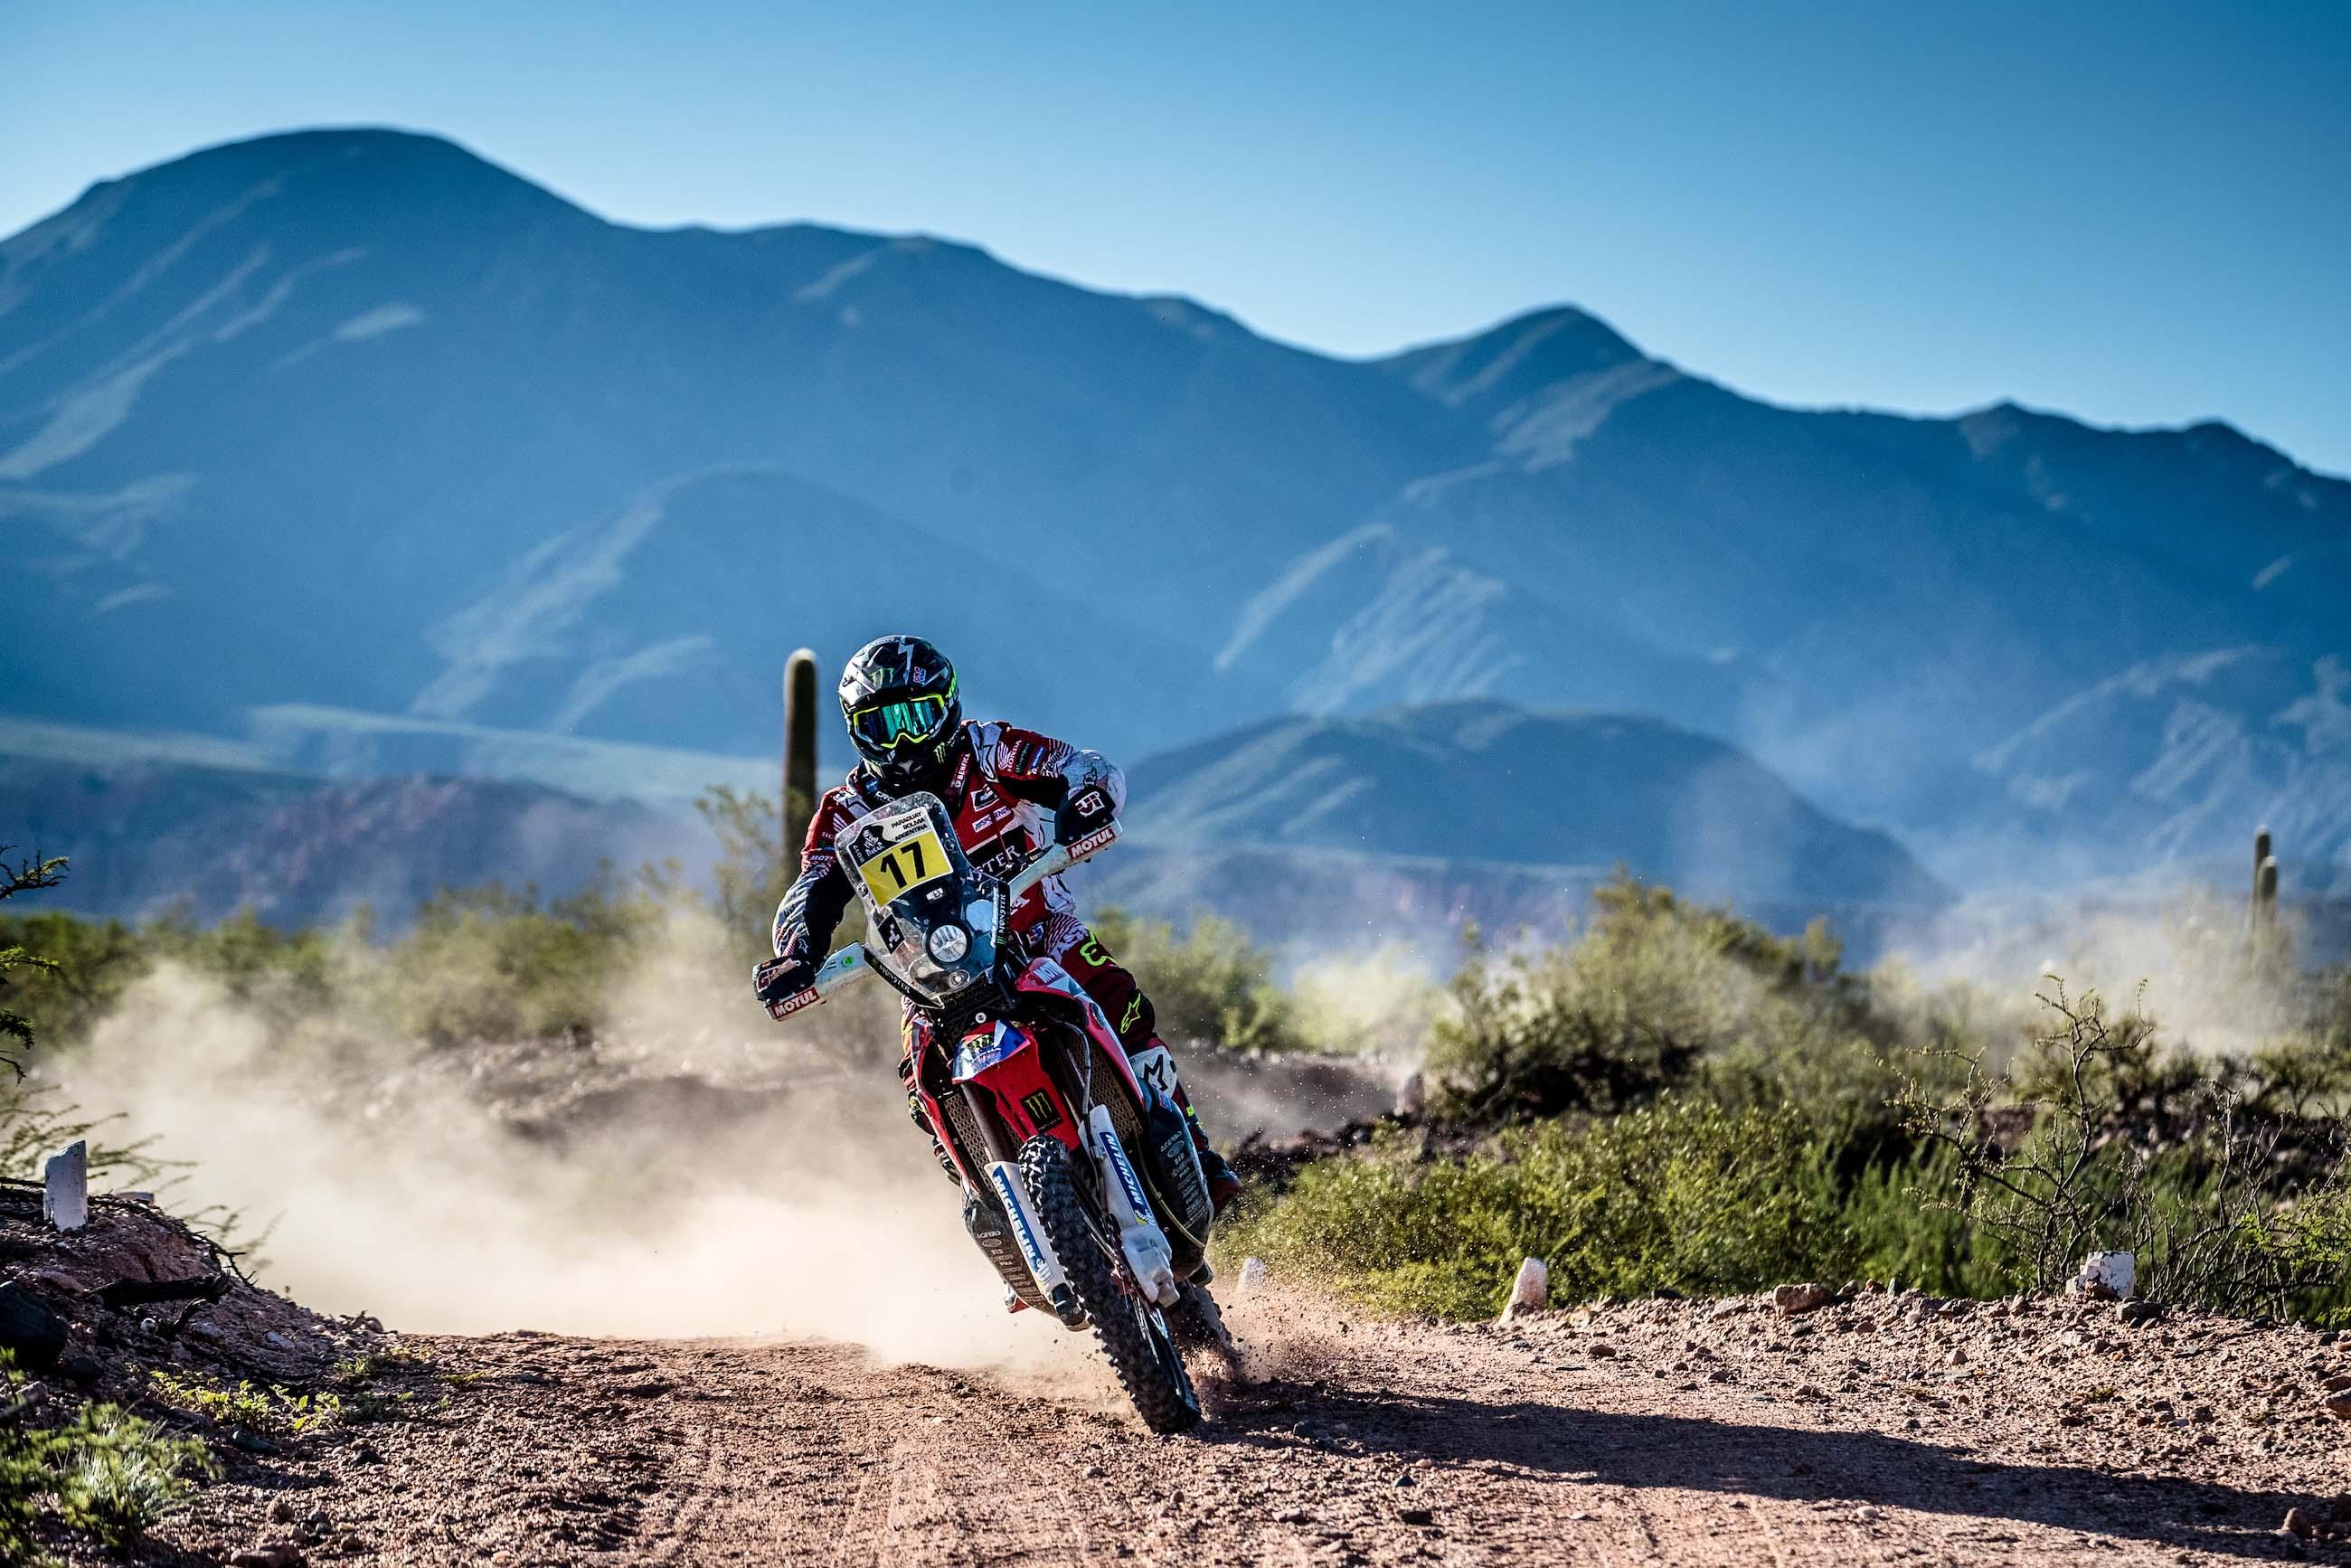 2017 Dakar Rally – Stage 3 Results